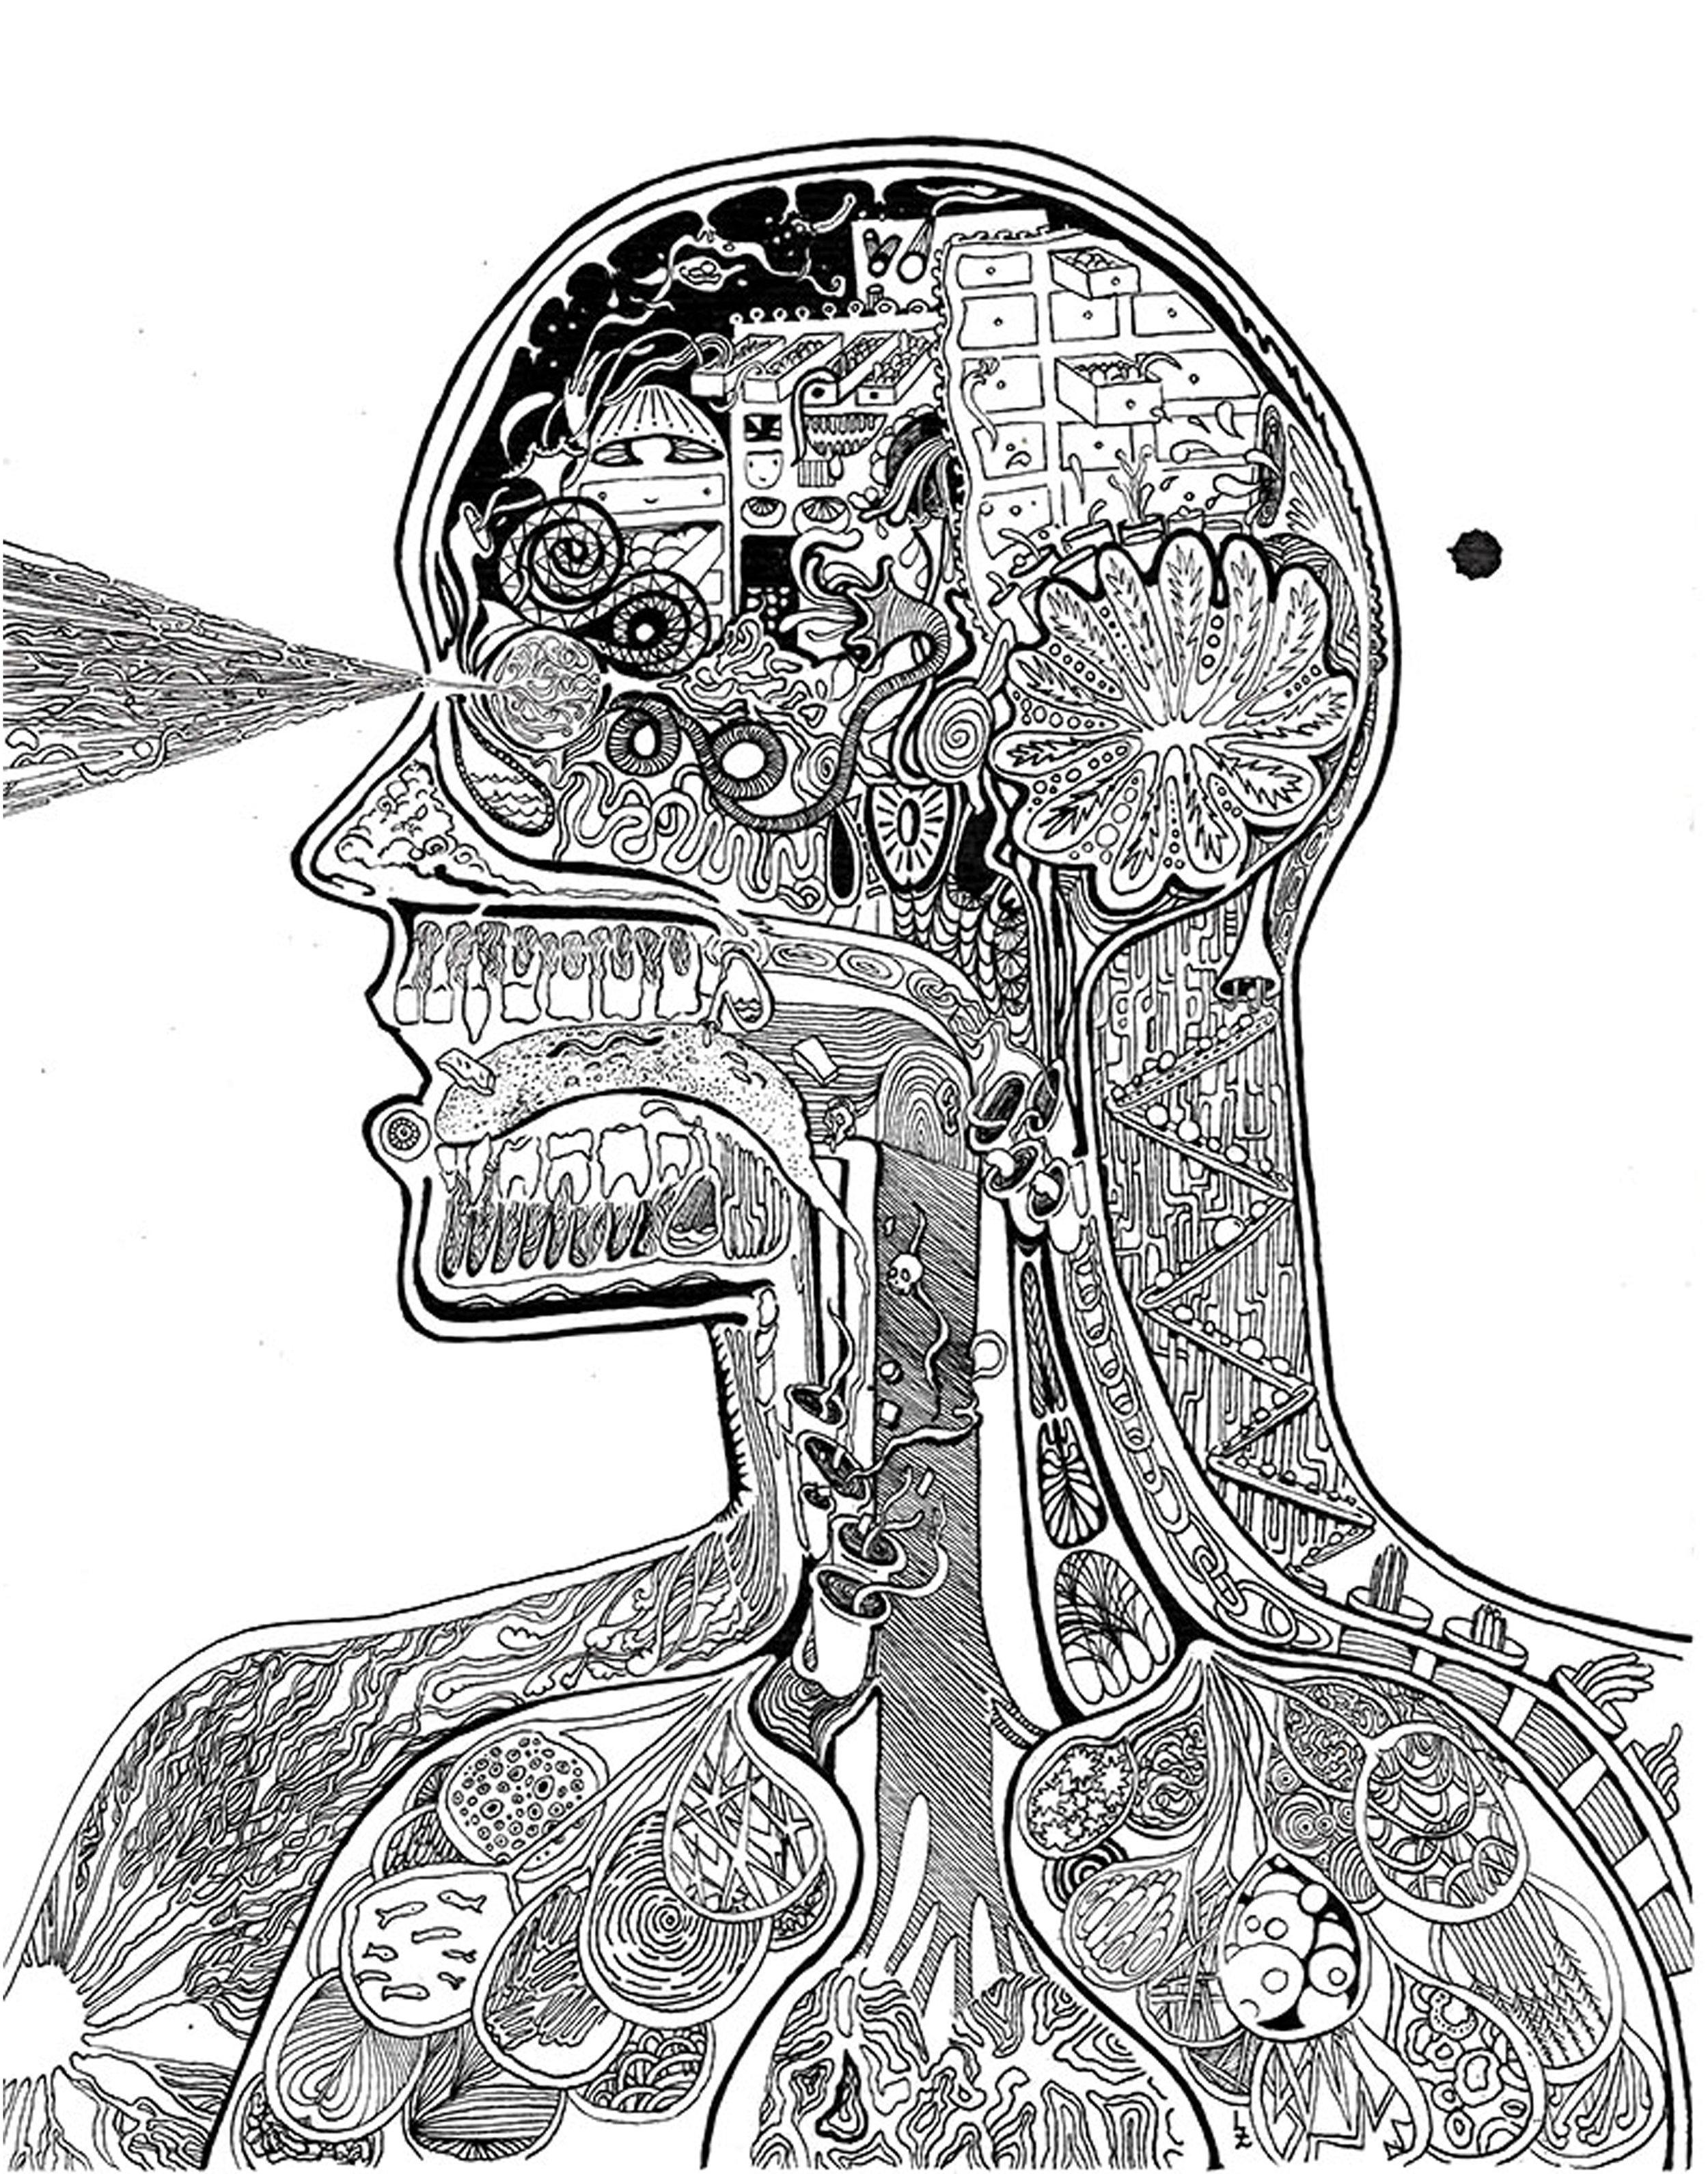 Insidemyheadprint.jpg